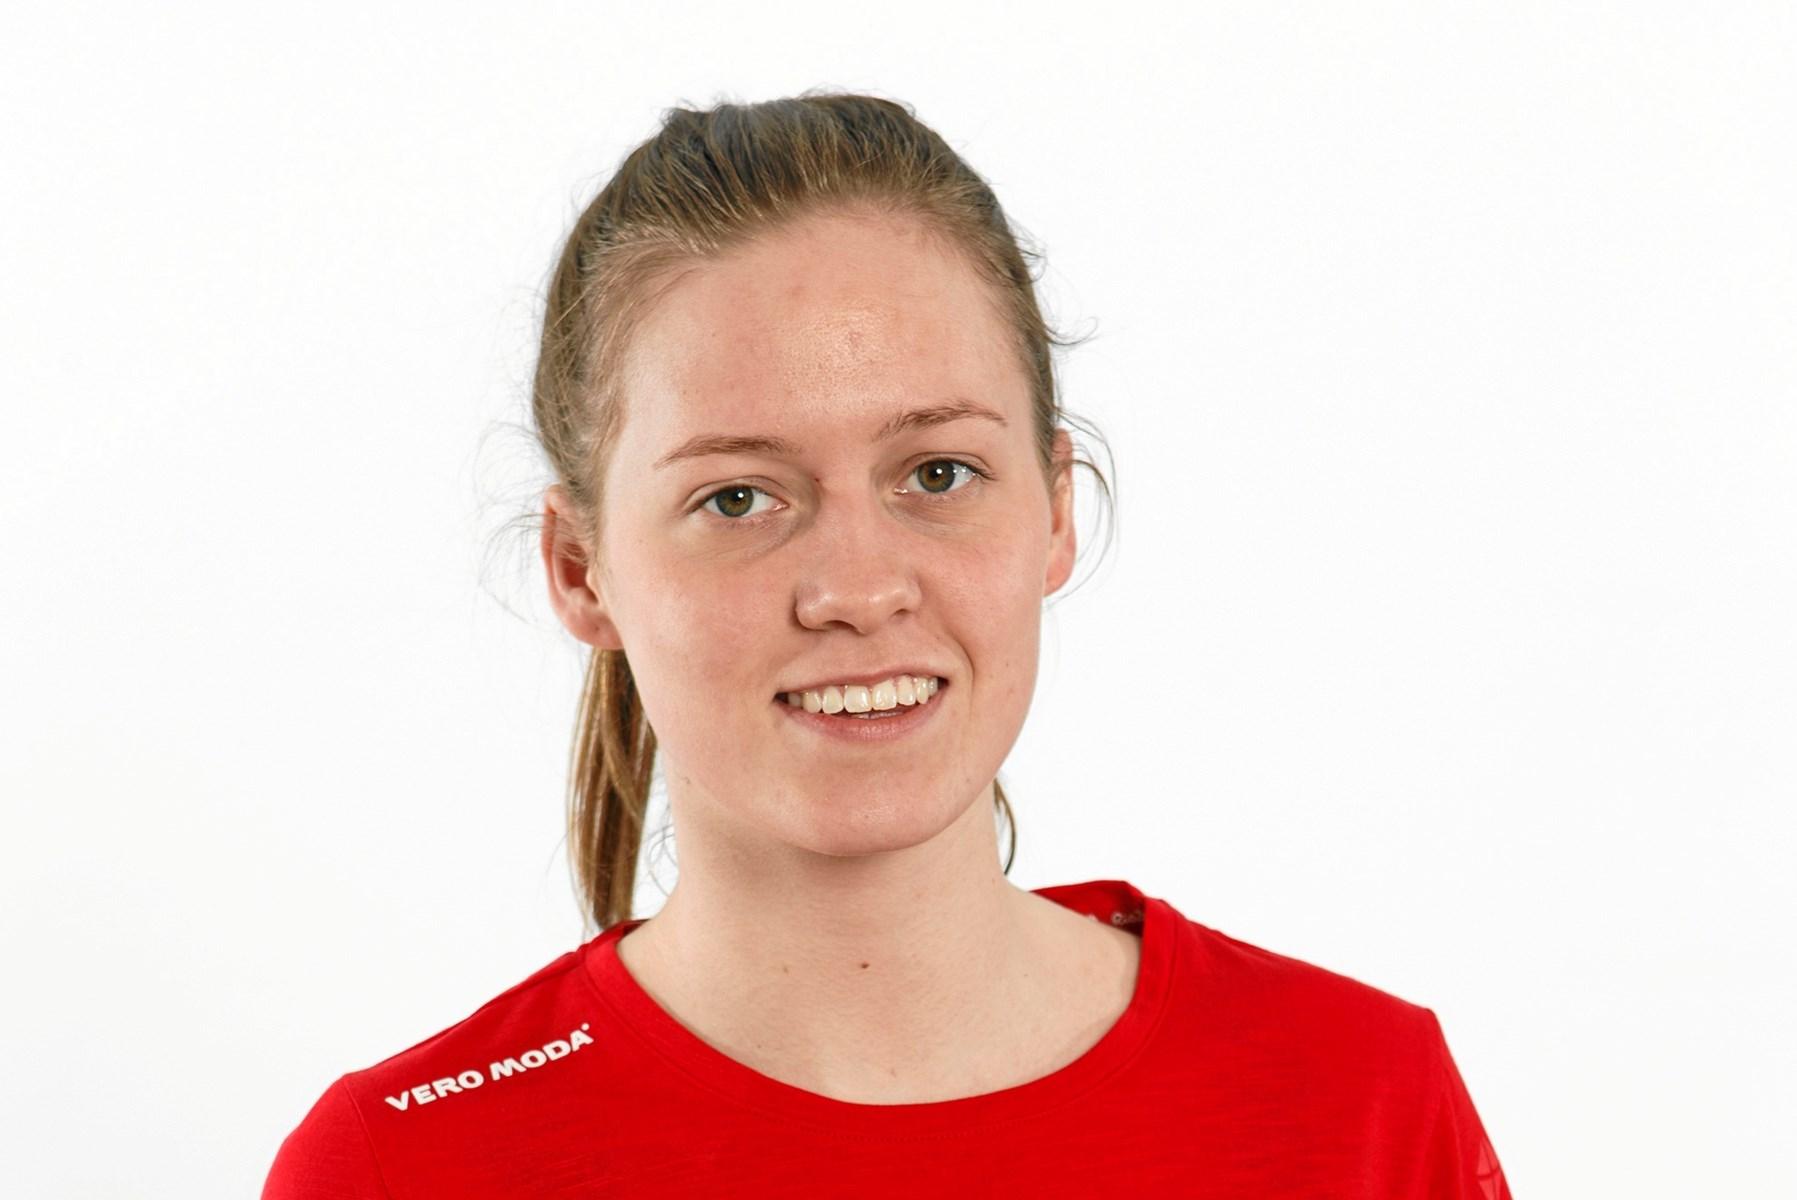 20-årige Laura Martens Christensen repræsenterer Svømmeklubben NORD i Irland. Foto: Jyskpressefoto.dk